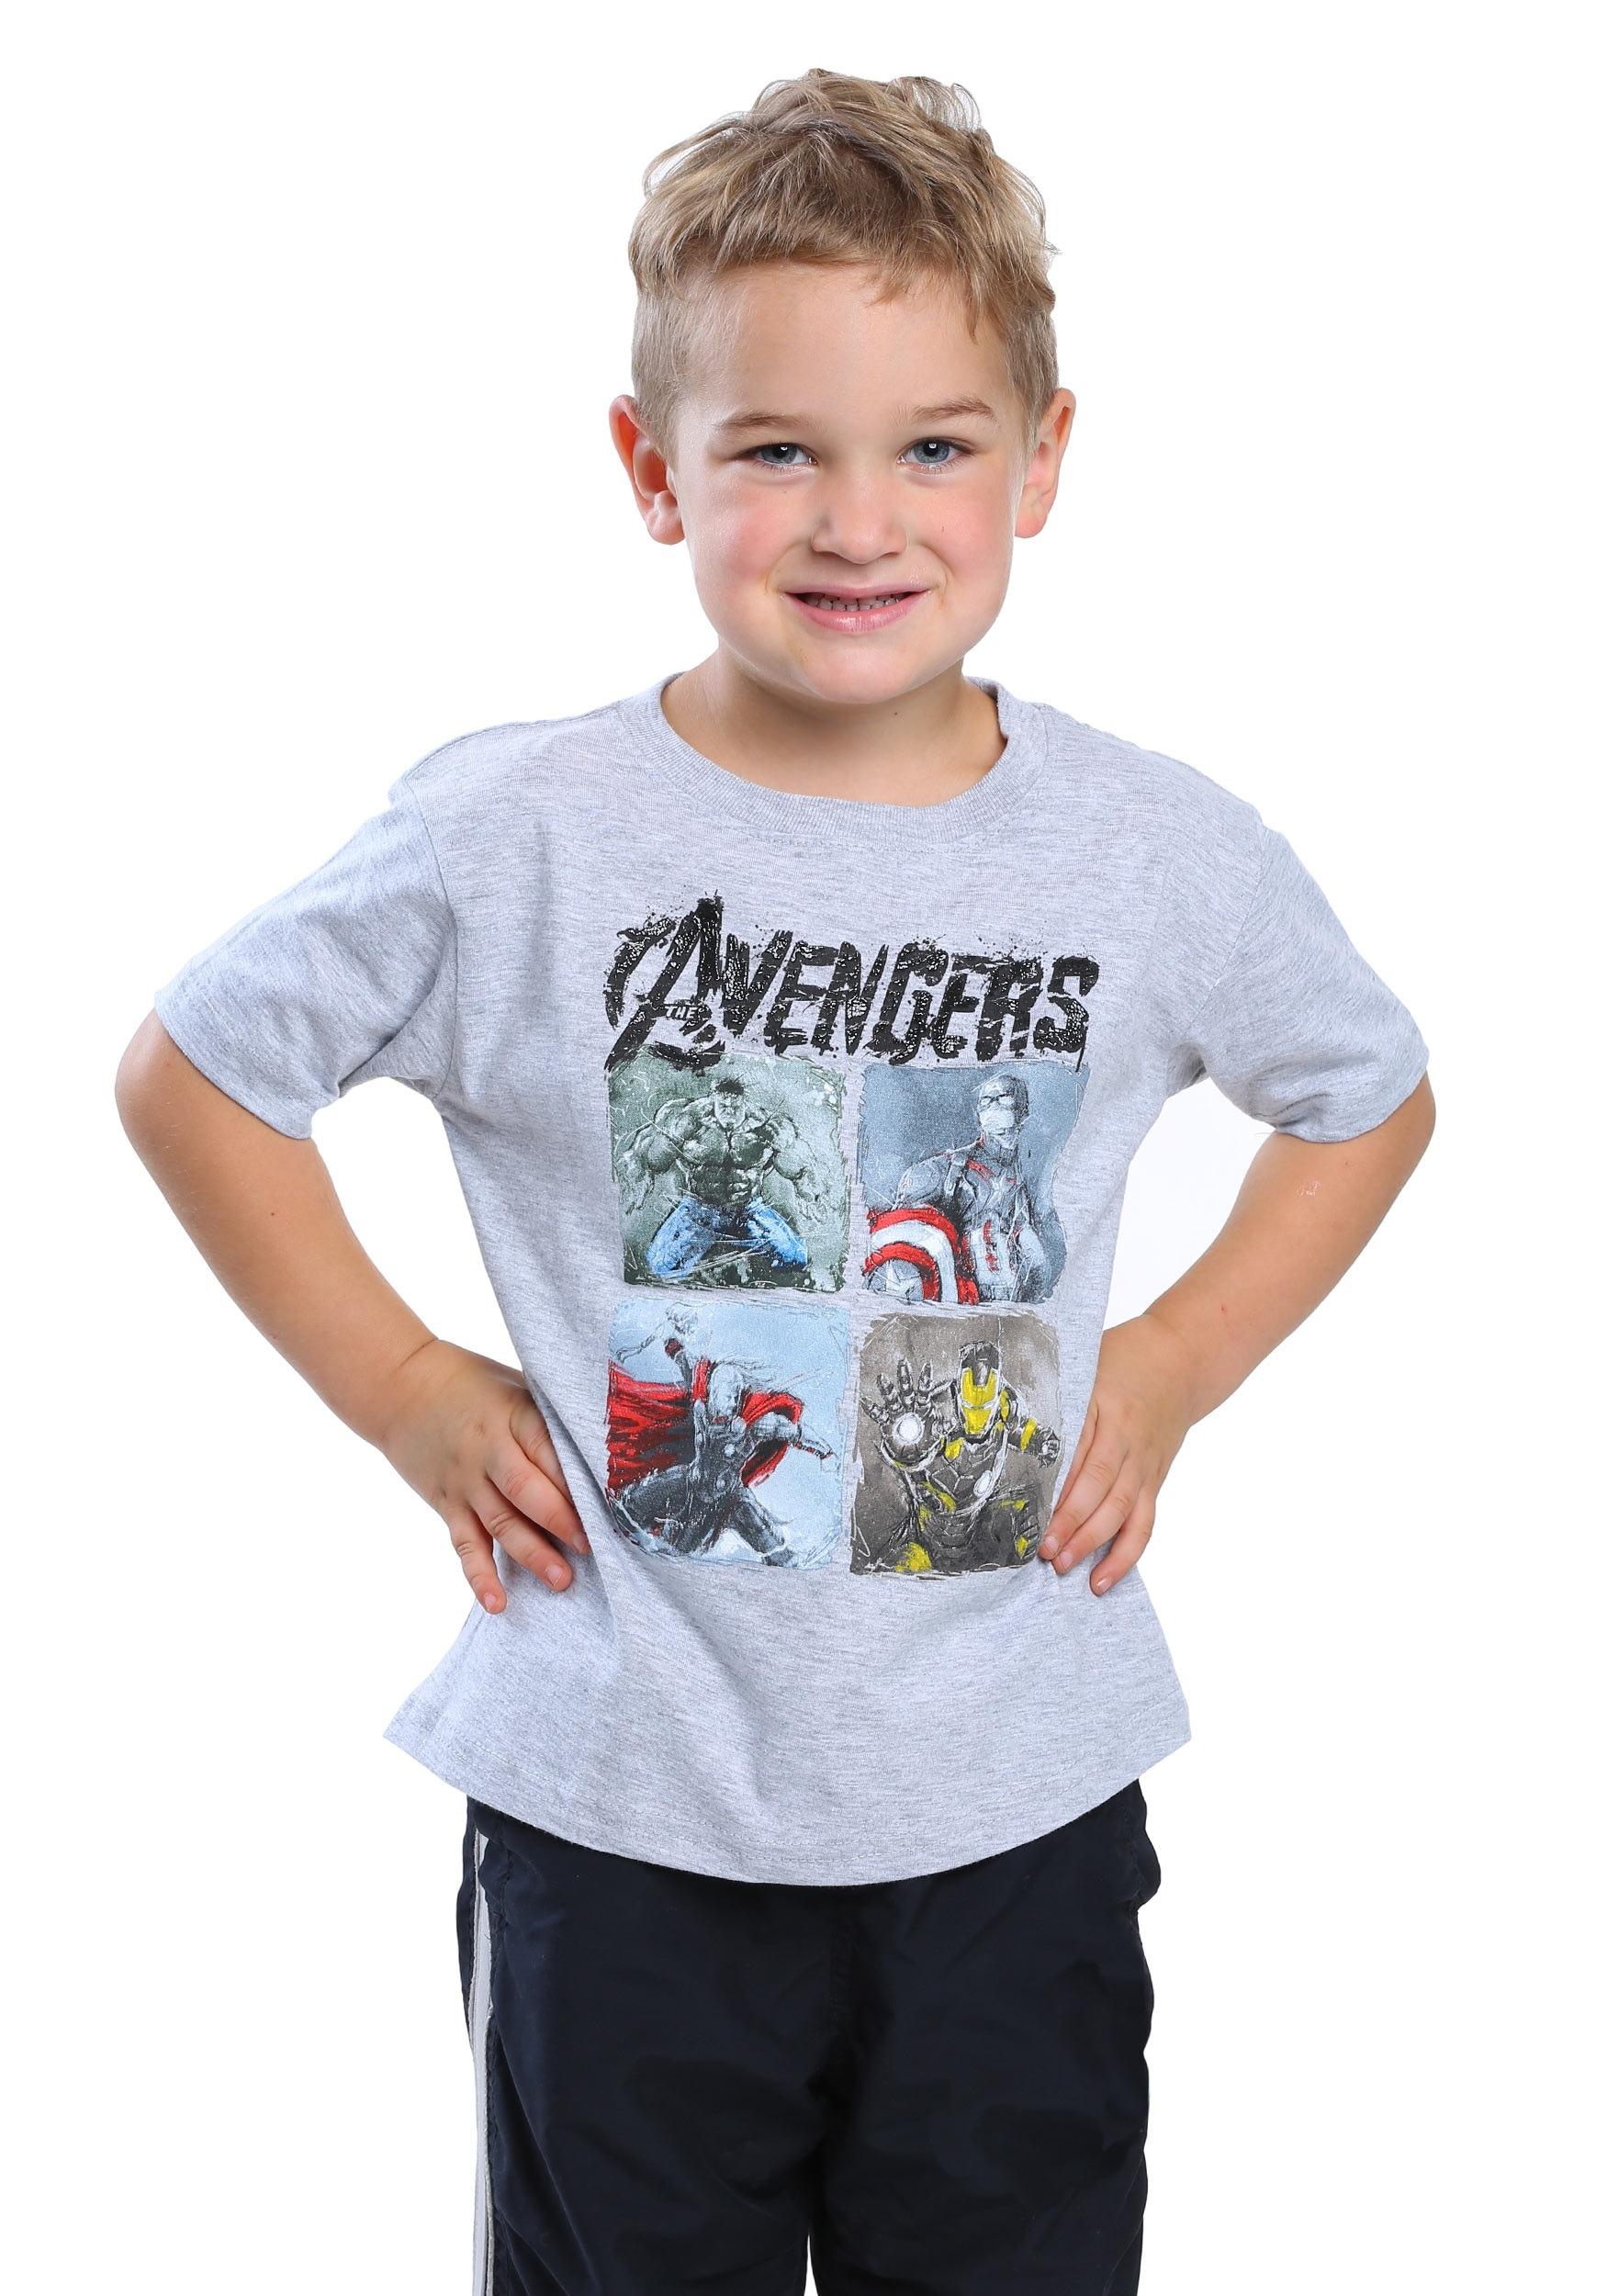 Toddler Boy Long Blonde Hair Surfer: Avengers Scratch Plates Toddler Boys Heather Grey T-Shirt